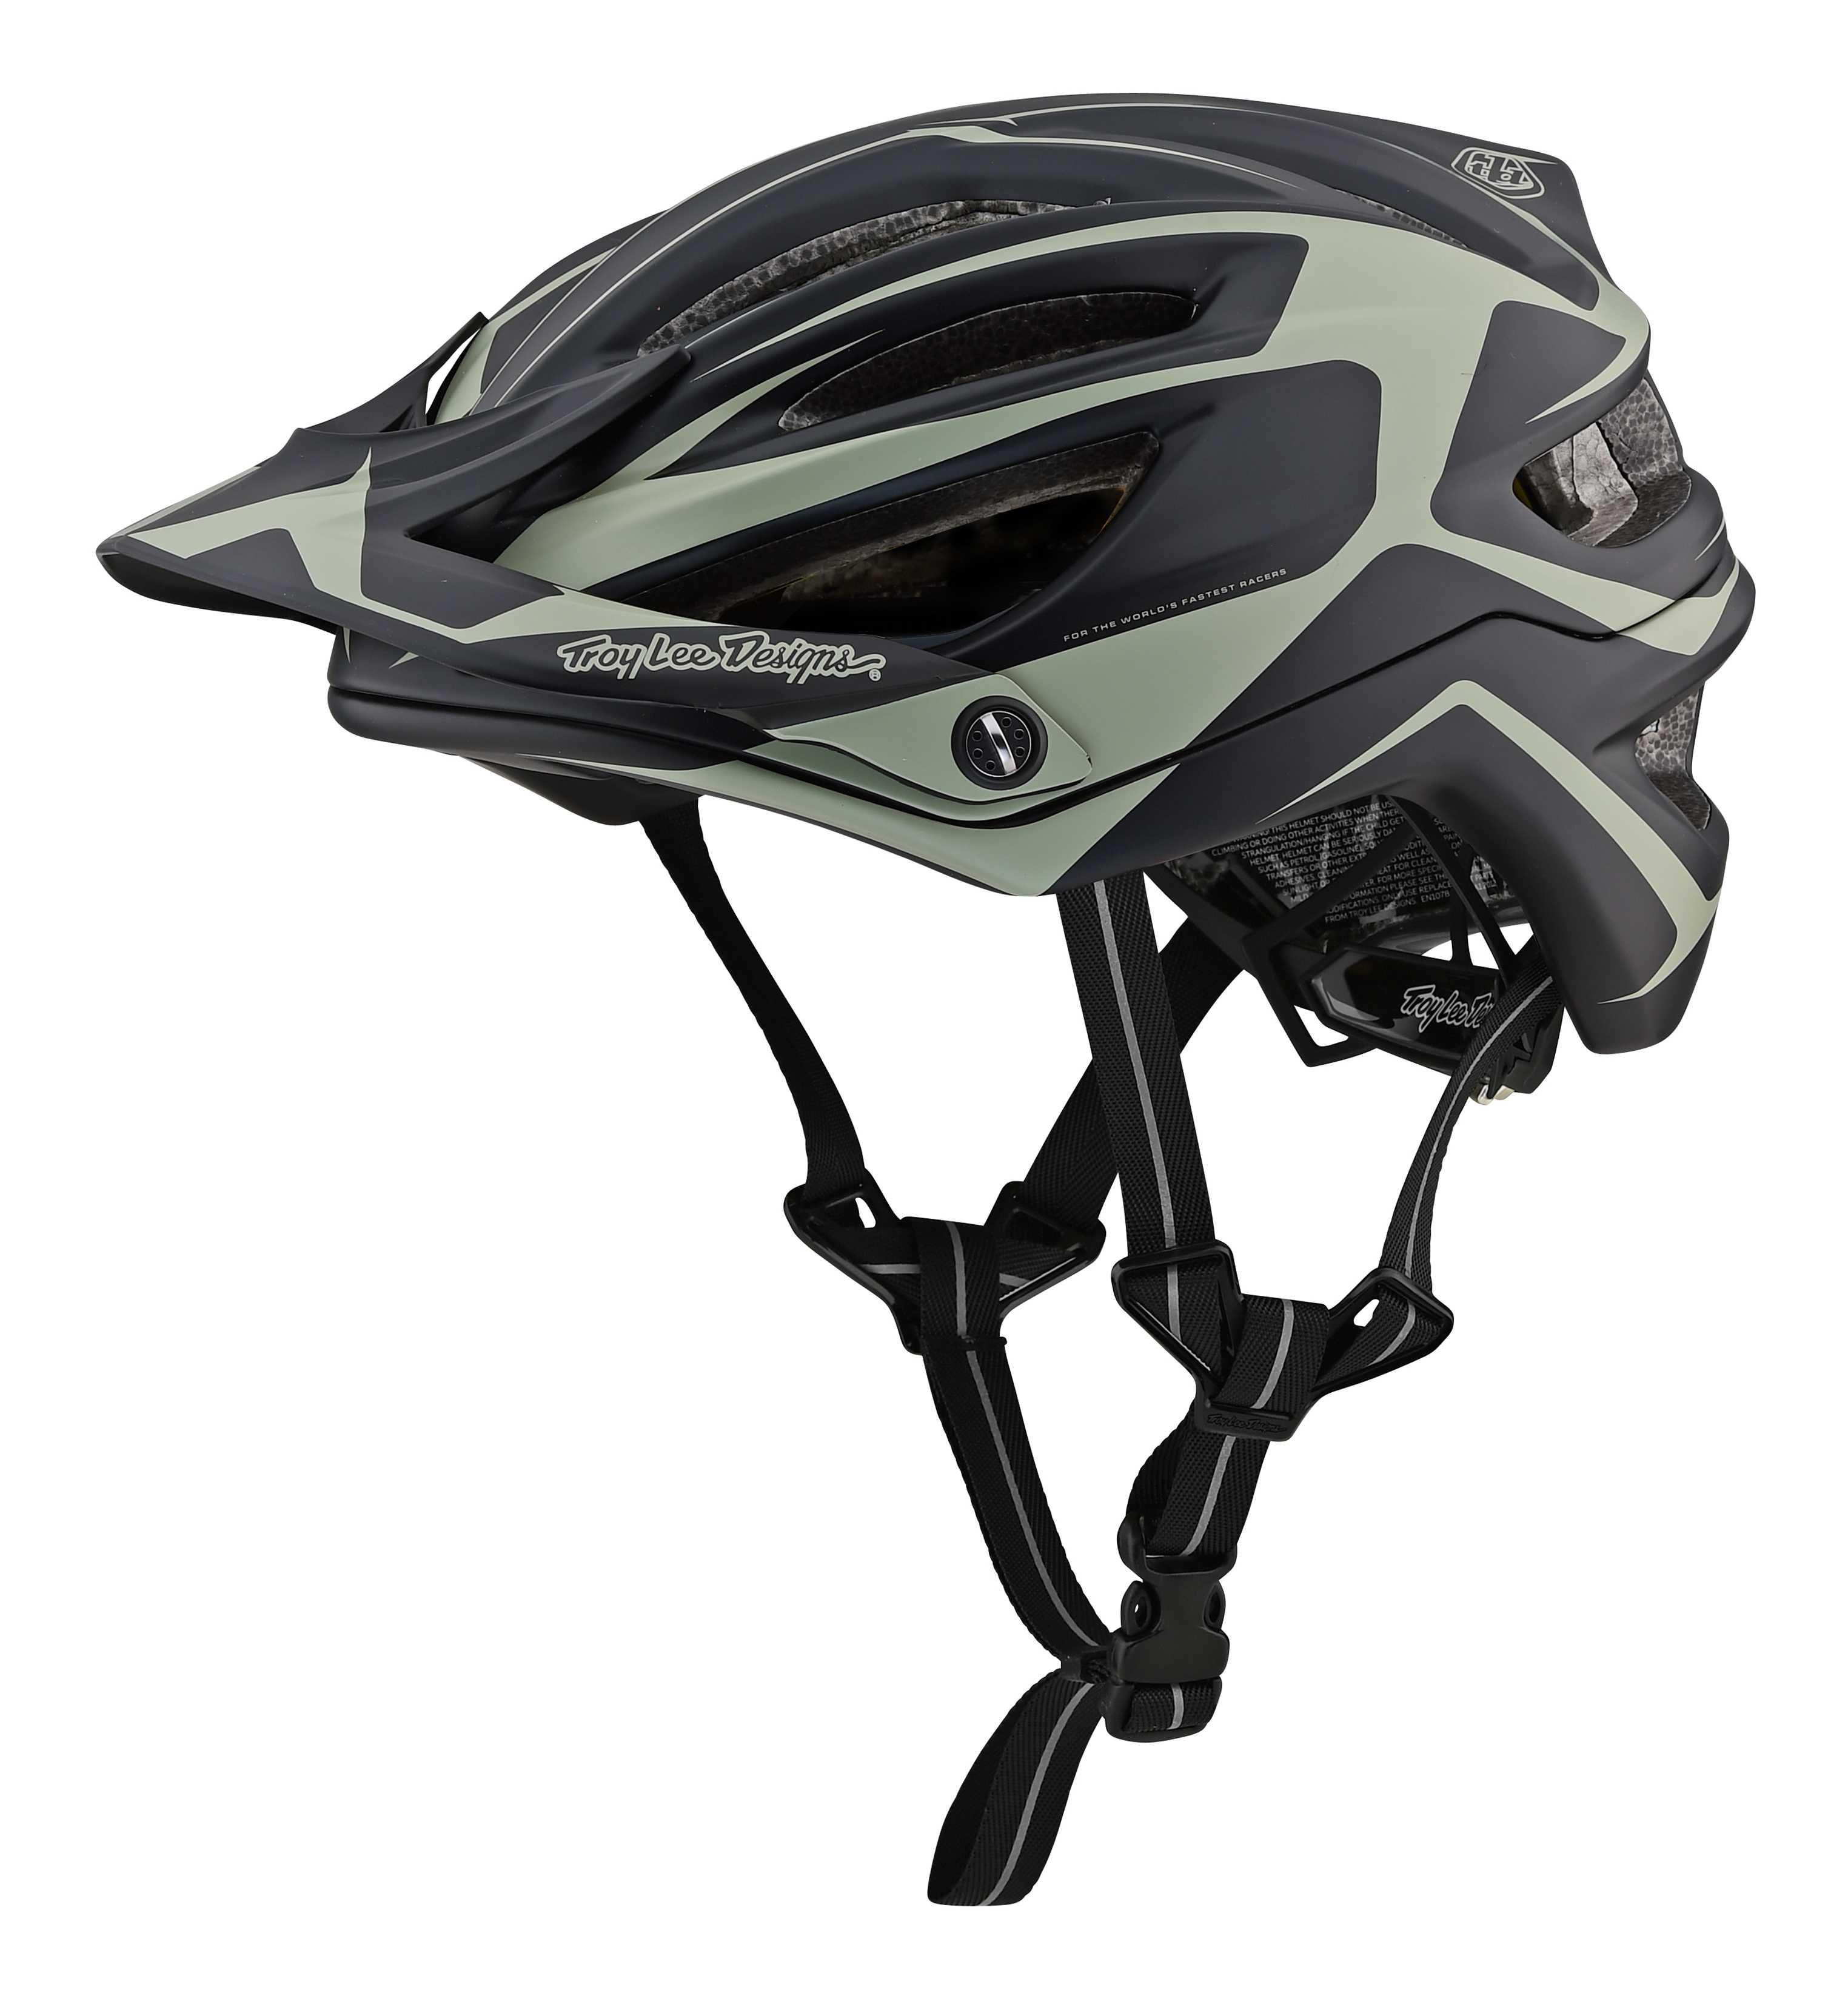 Hjelm Troy Lee Designs A2 Dropout MIPS sort/grå | Helmets